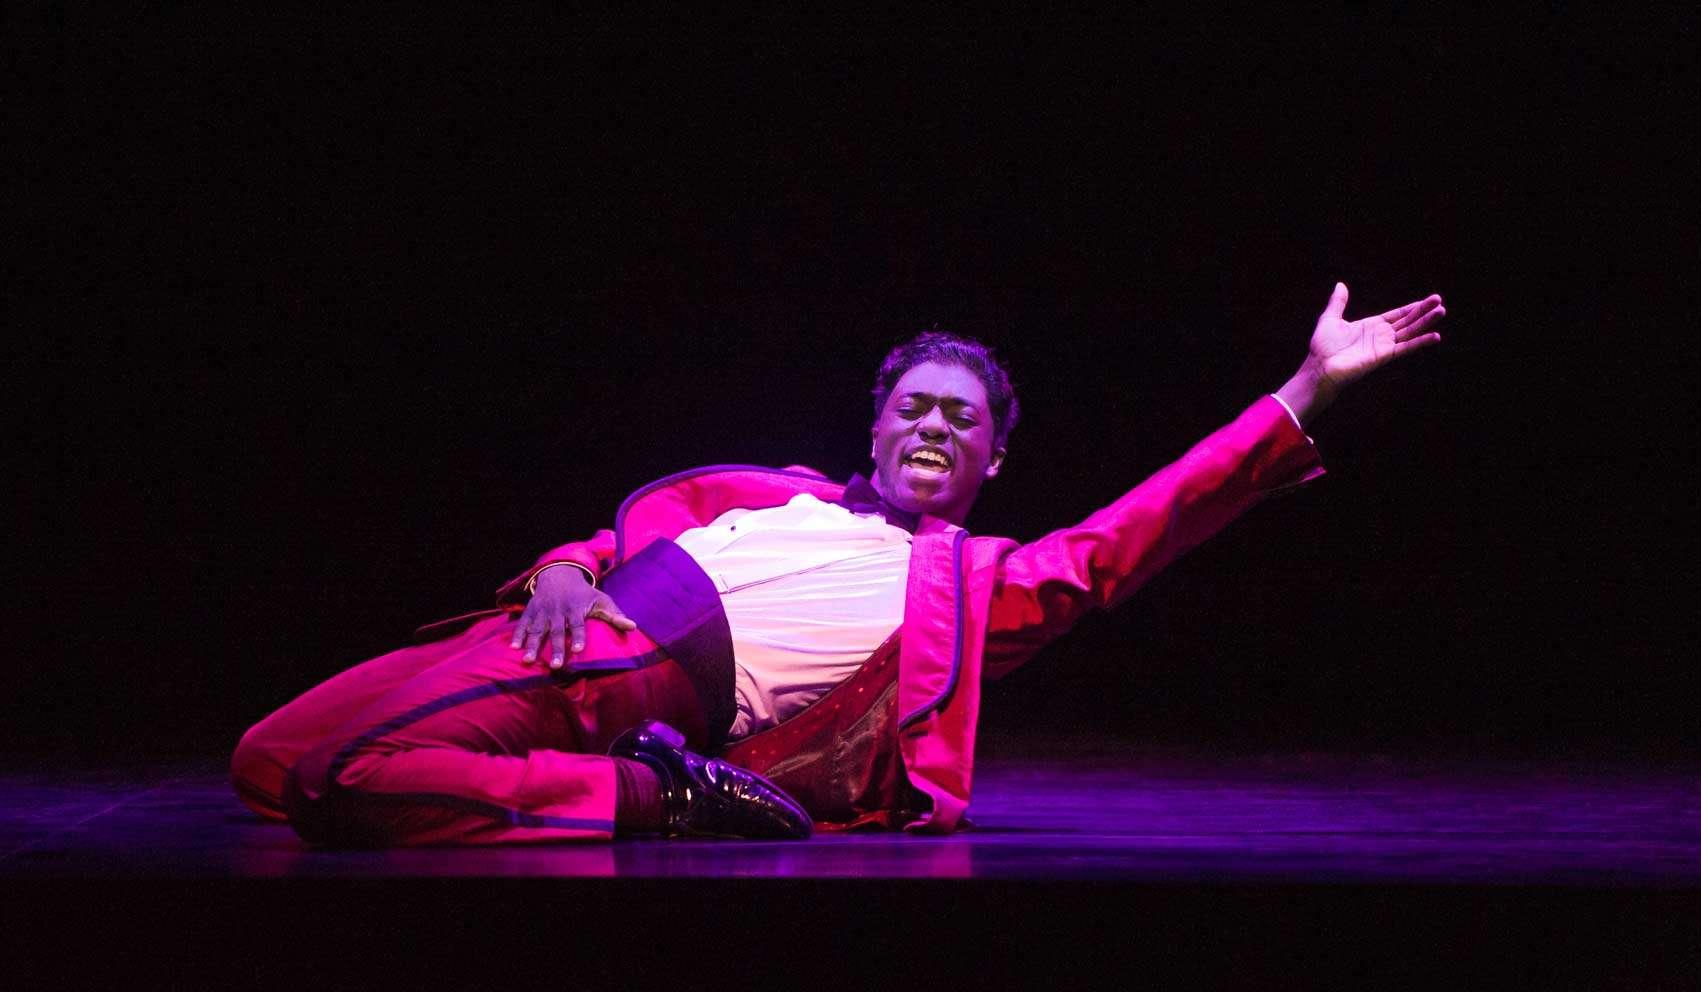 Samuel Edwards (Jackie Wilson) in Motown the Musical. Photo: Alastair Muir | First Look: Motown the Musical